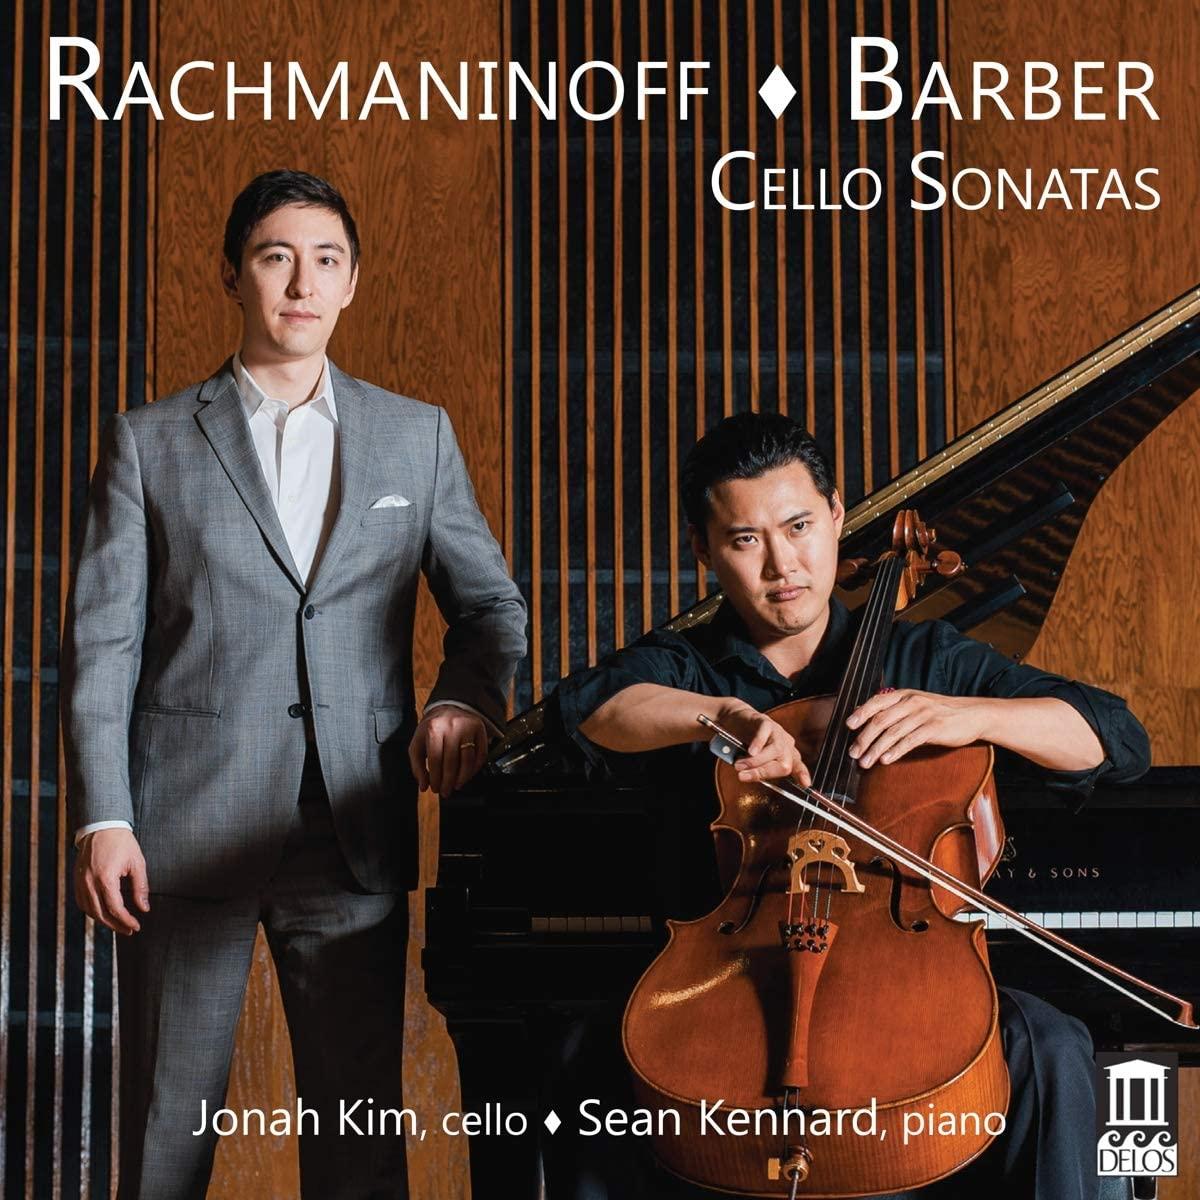 Review of BARBER. RACHMANINOV Cello Sonatas (Jonah Kim)